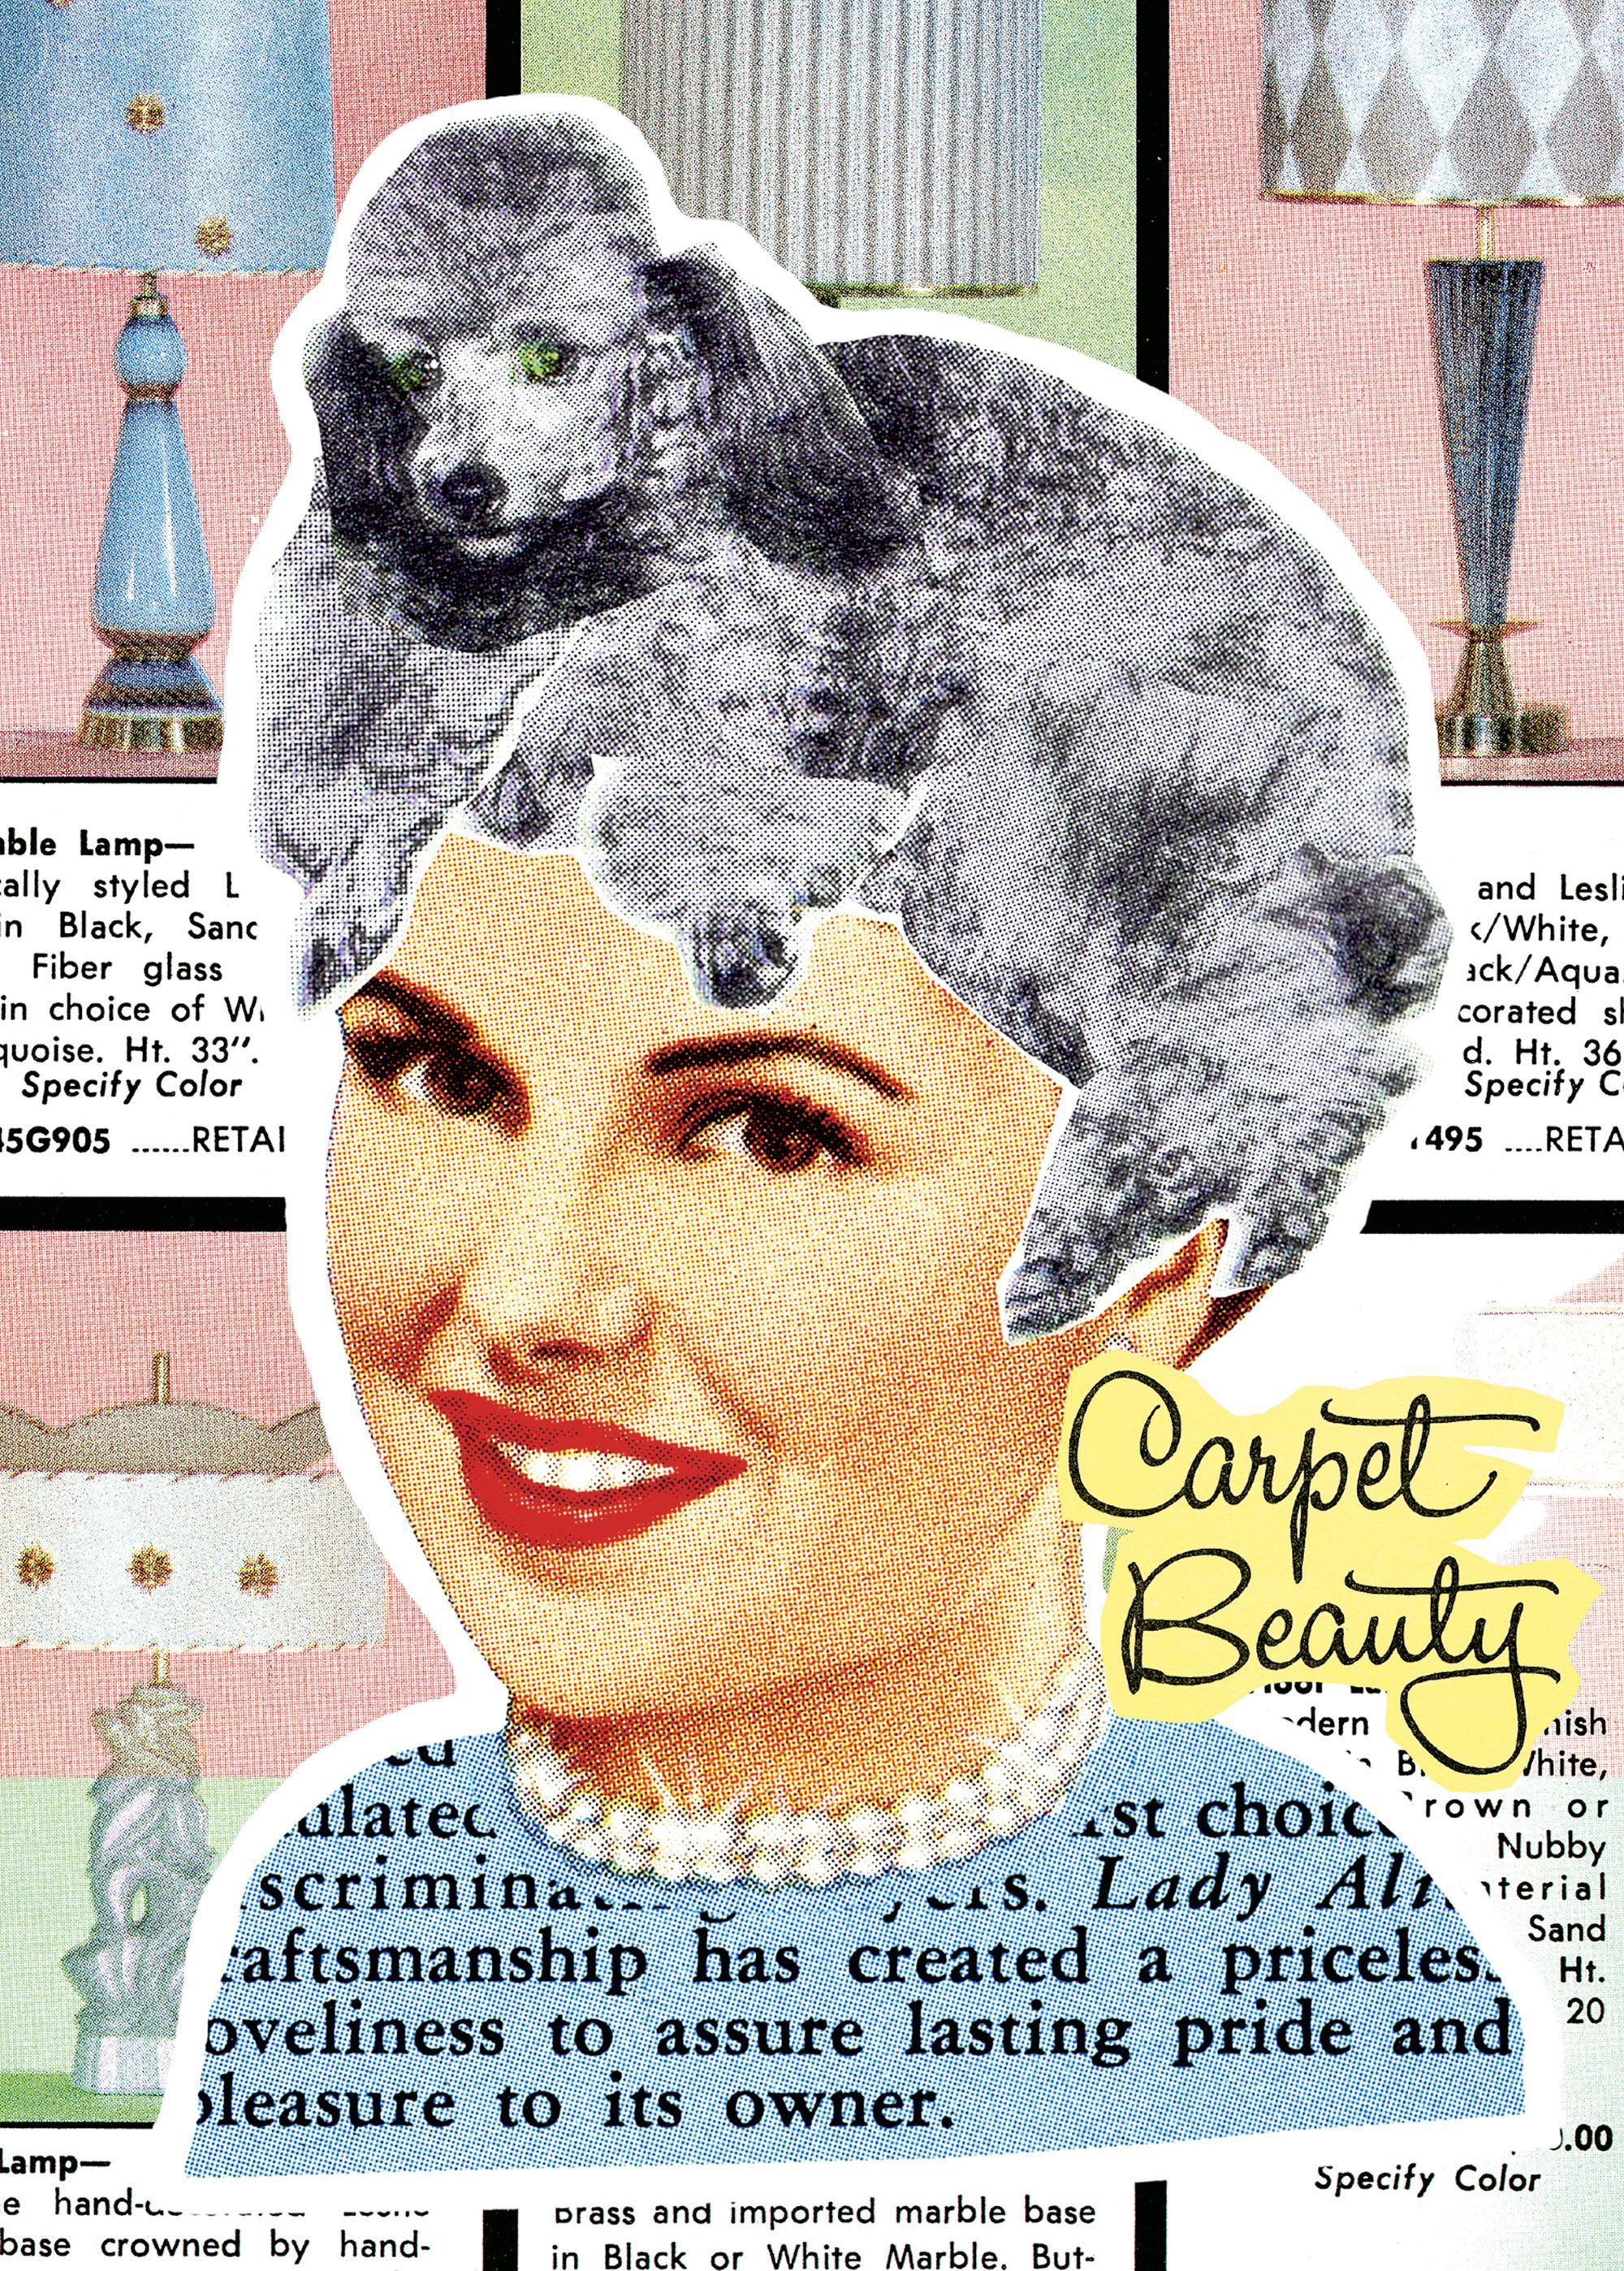 Vintage Beauty Ads You Won't Believe — Vintage Makeup Ads